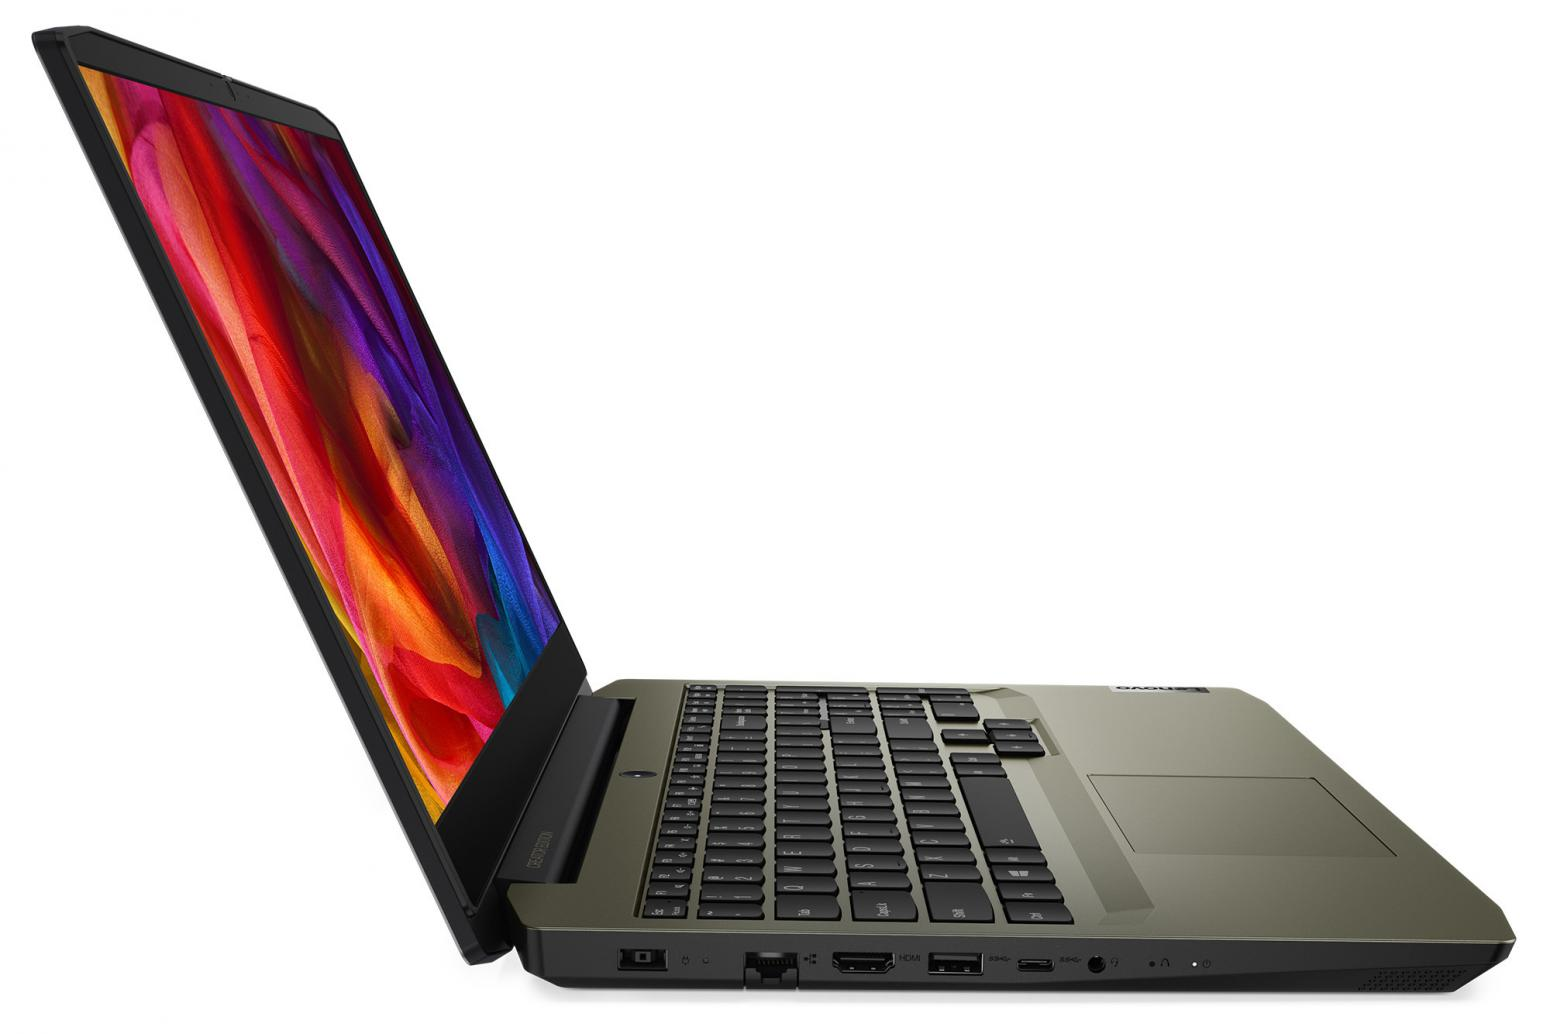 Ordinateur portable Lenovo  IdeaPad Creator 5 15IMH05 (82D4004WFR) Vert Kaki - GTX 1650 Ti, 144Hz - photo 5